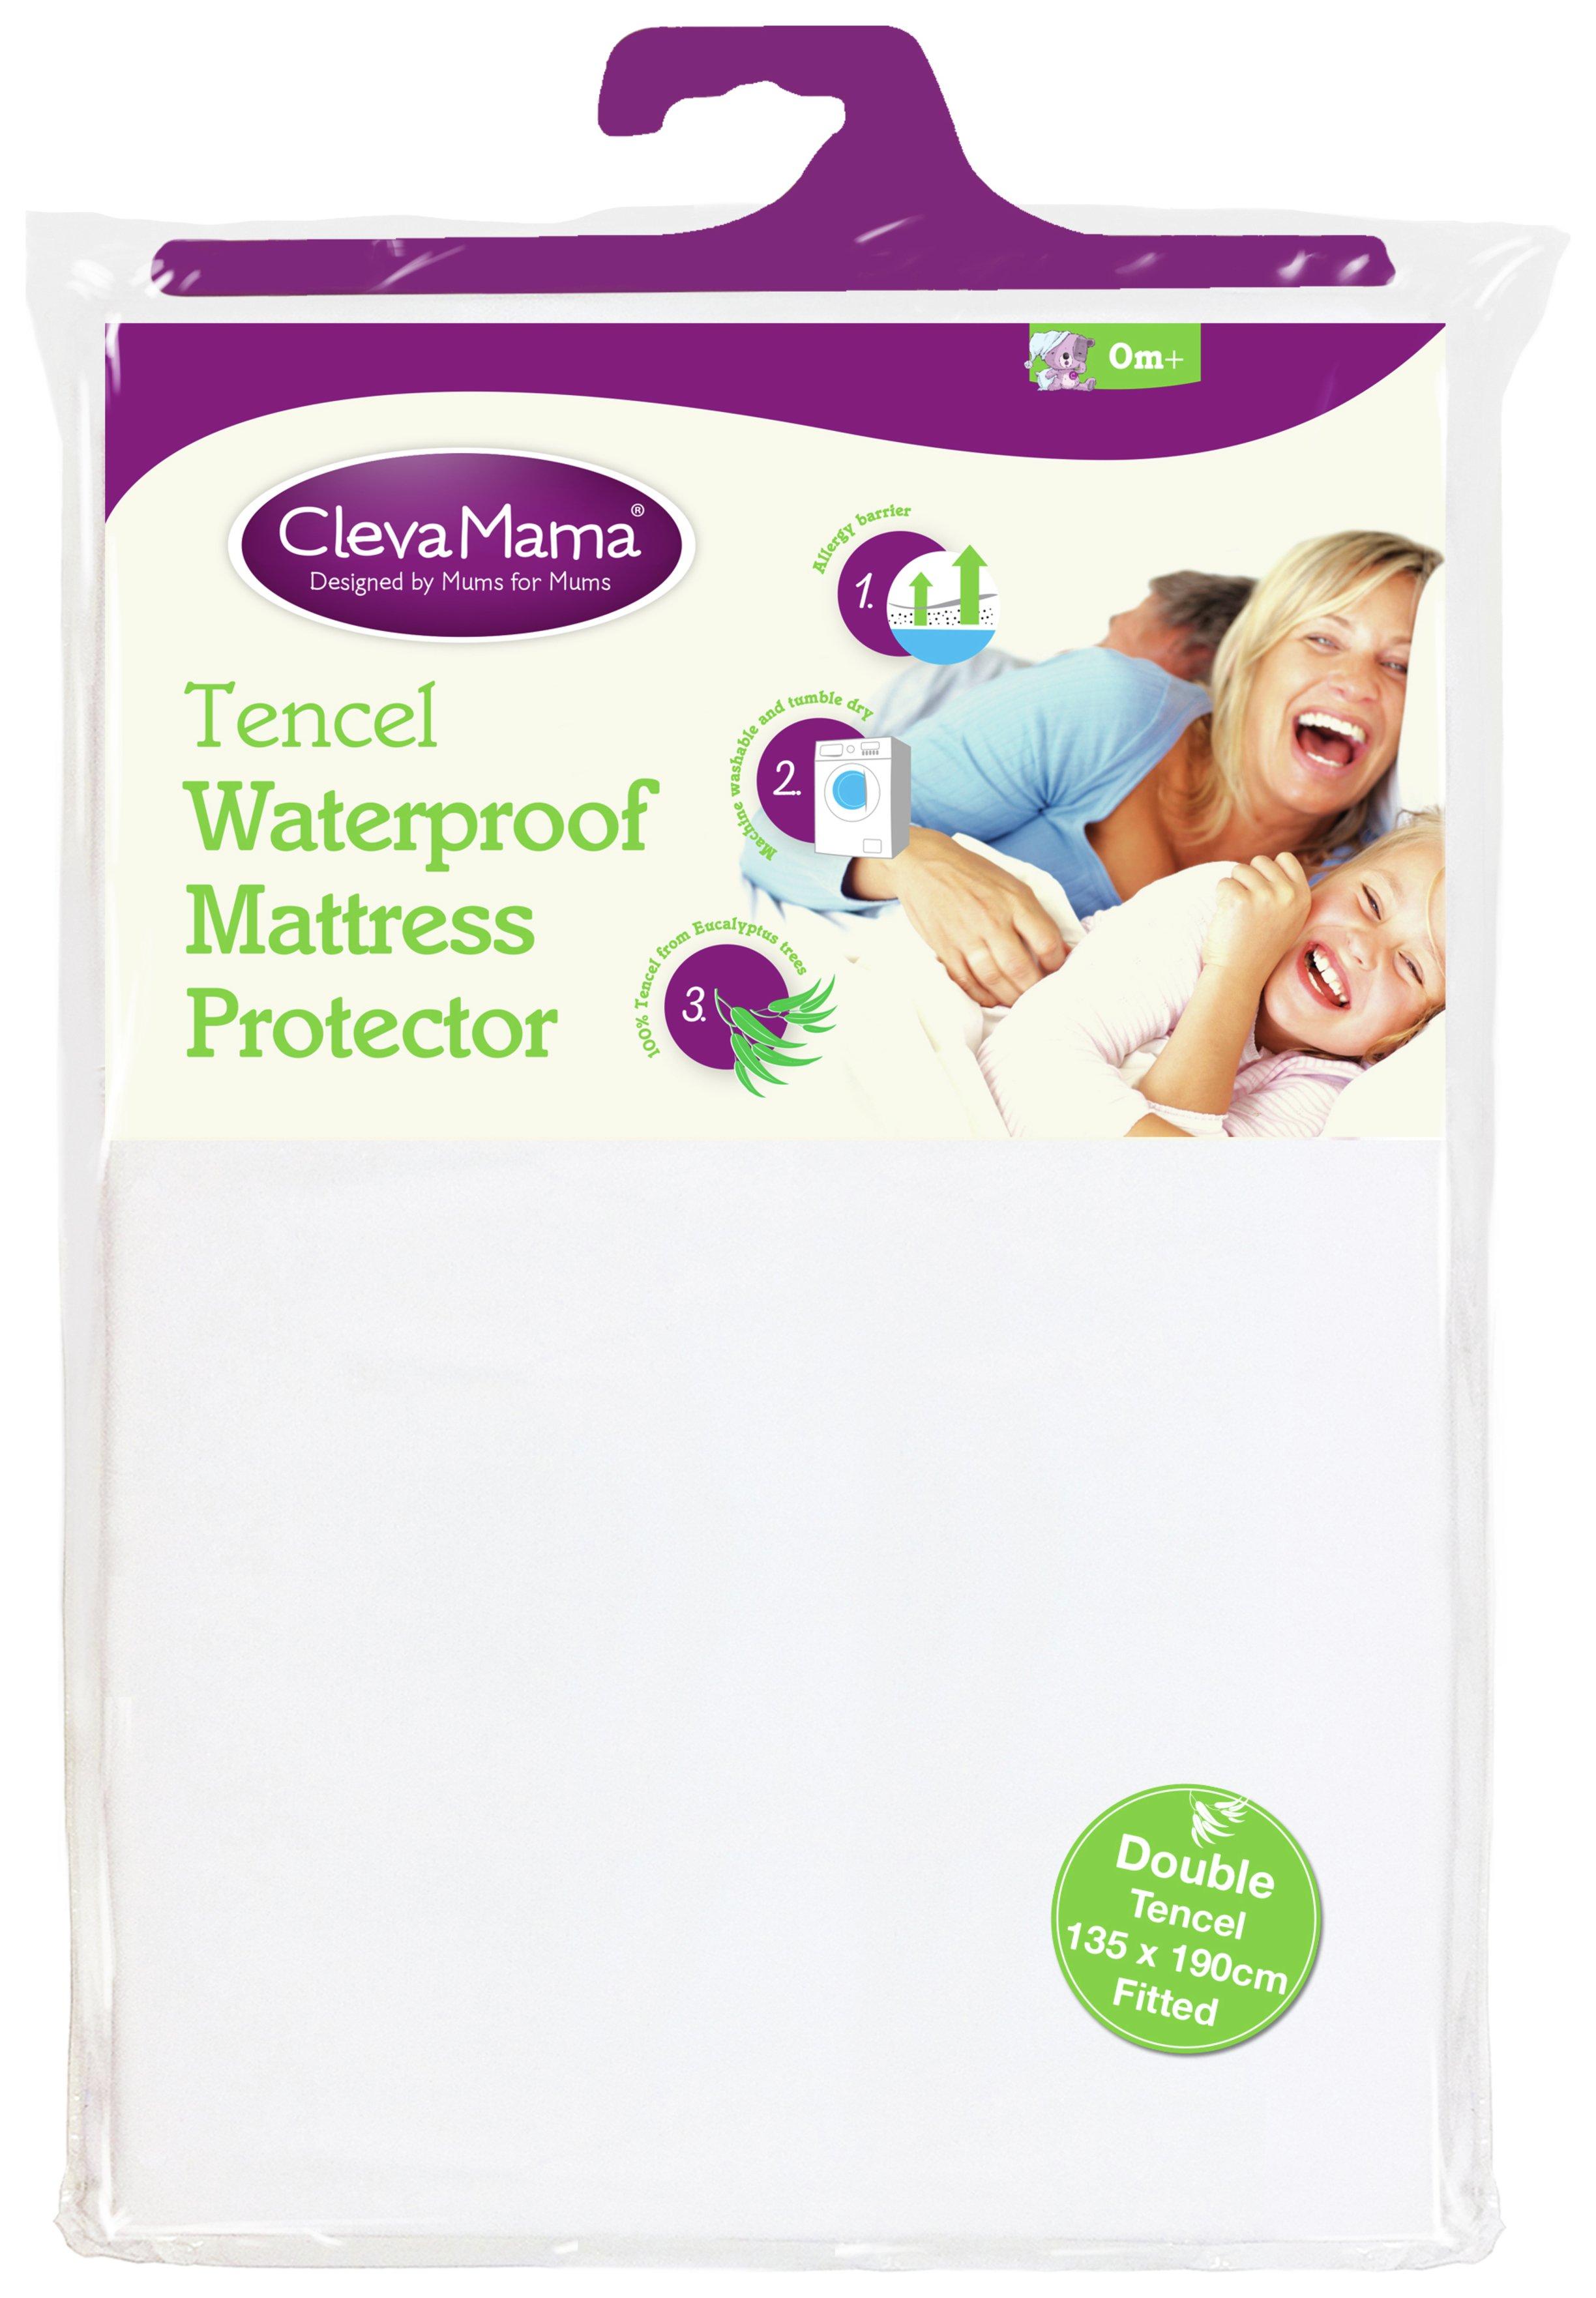 Image of Clevamama Tencel Waterproof Mattress Protector - Double.